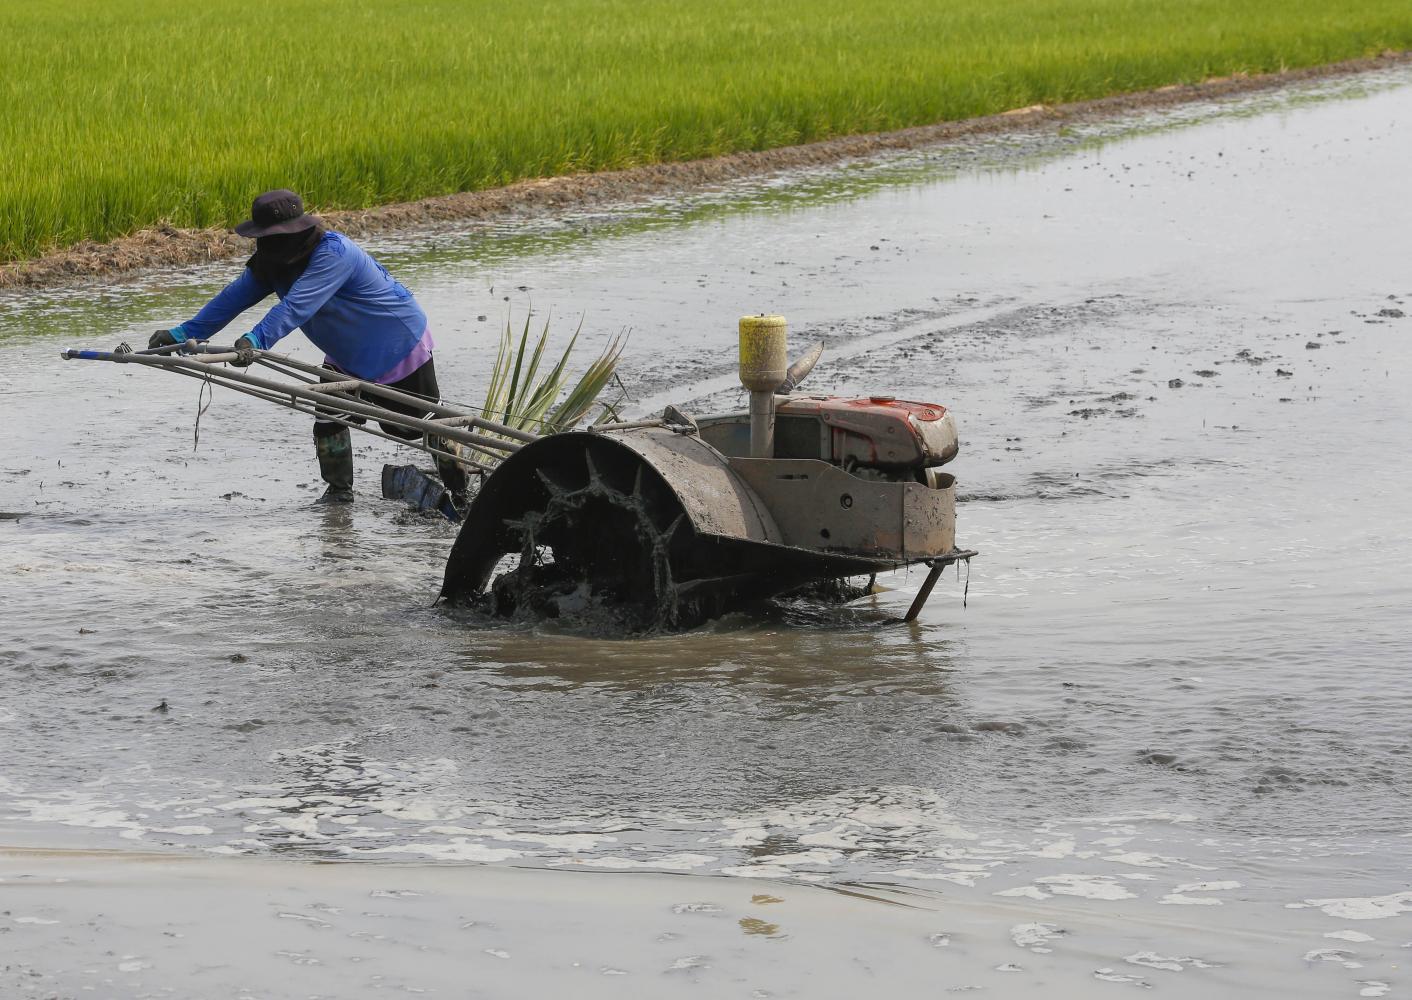 A farmer works in a rice field in Lat Lum Kaeo, Pathum Thani province.(Photo: Pattarapong Chatpattarasill)